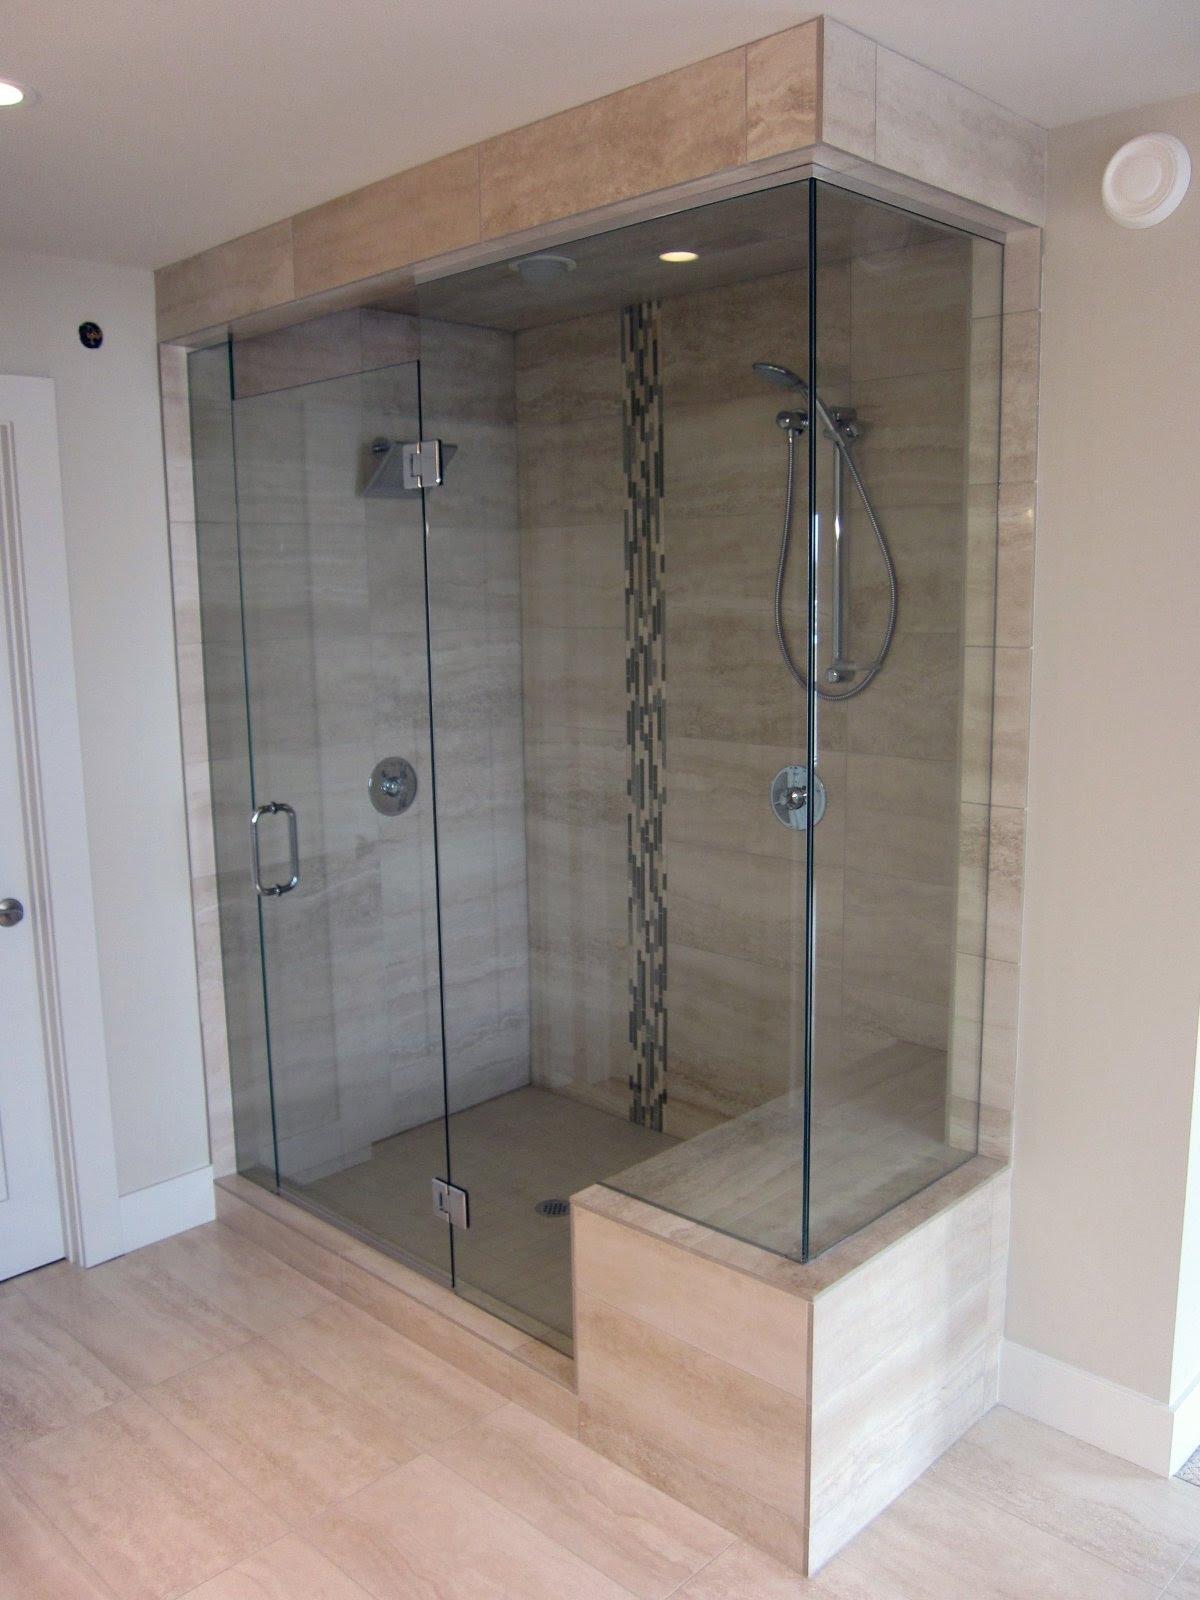 houseofmirrors - Bathroom